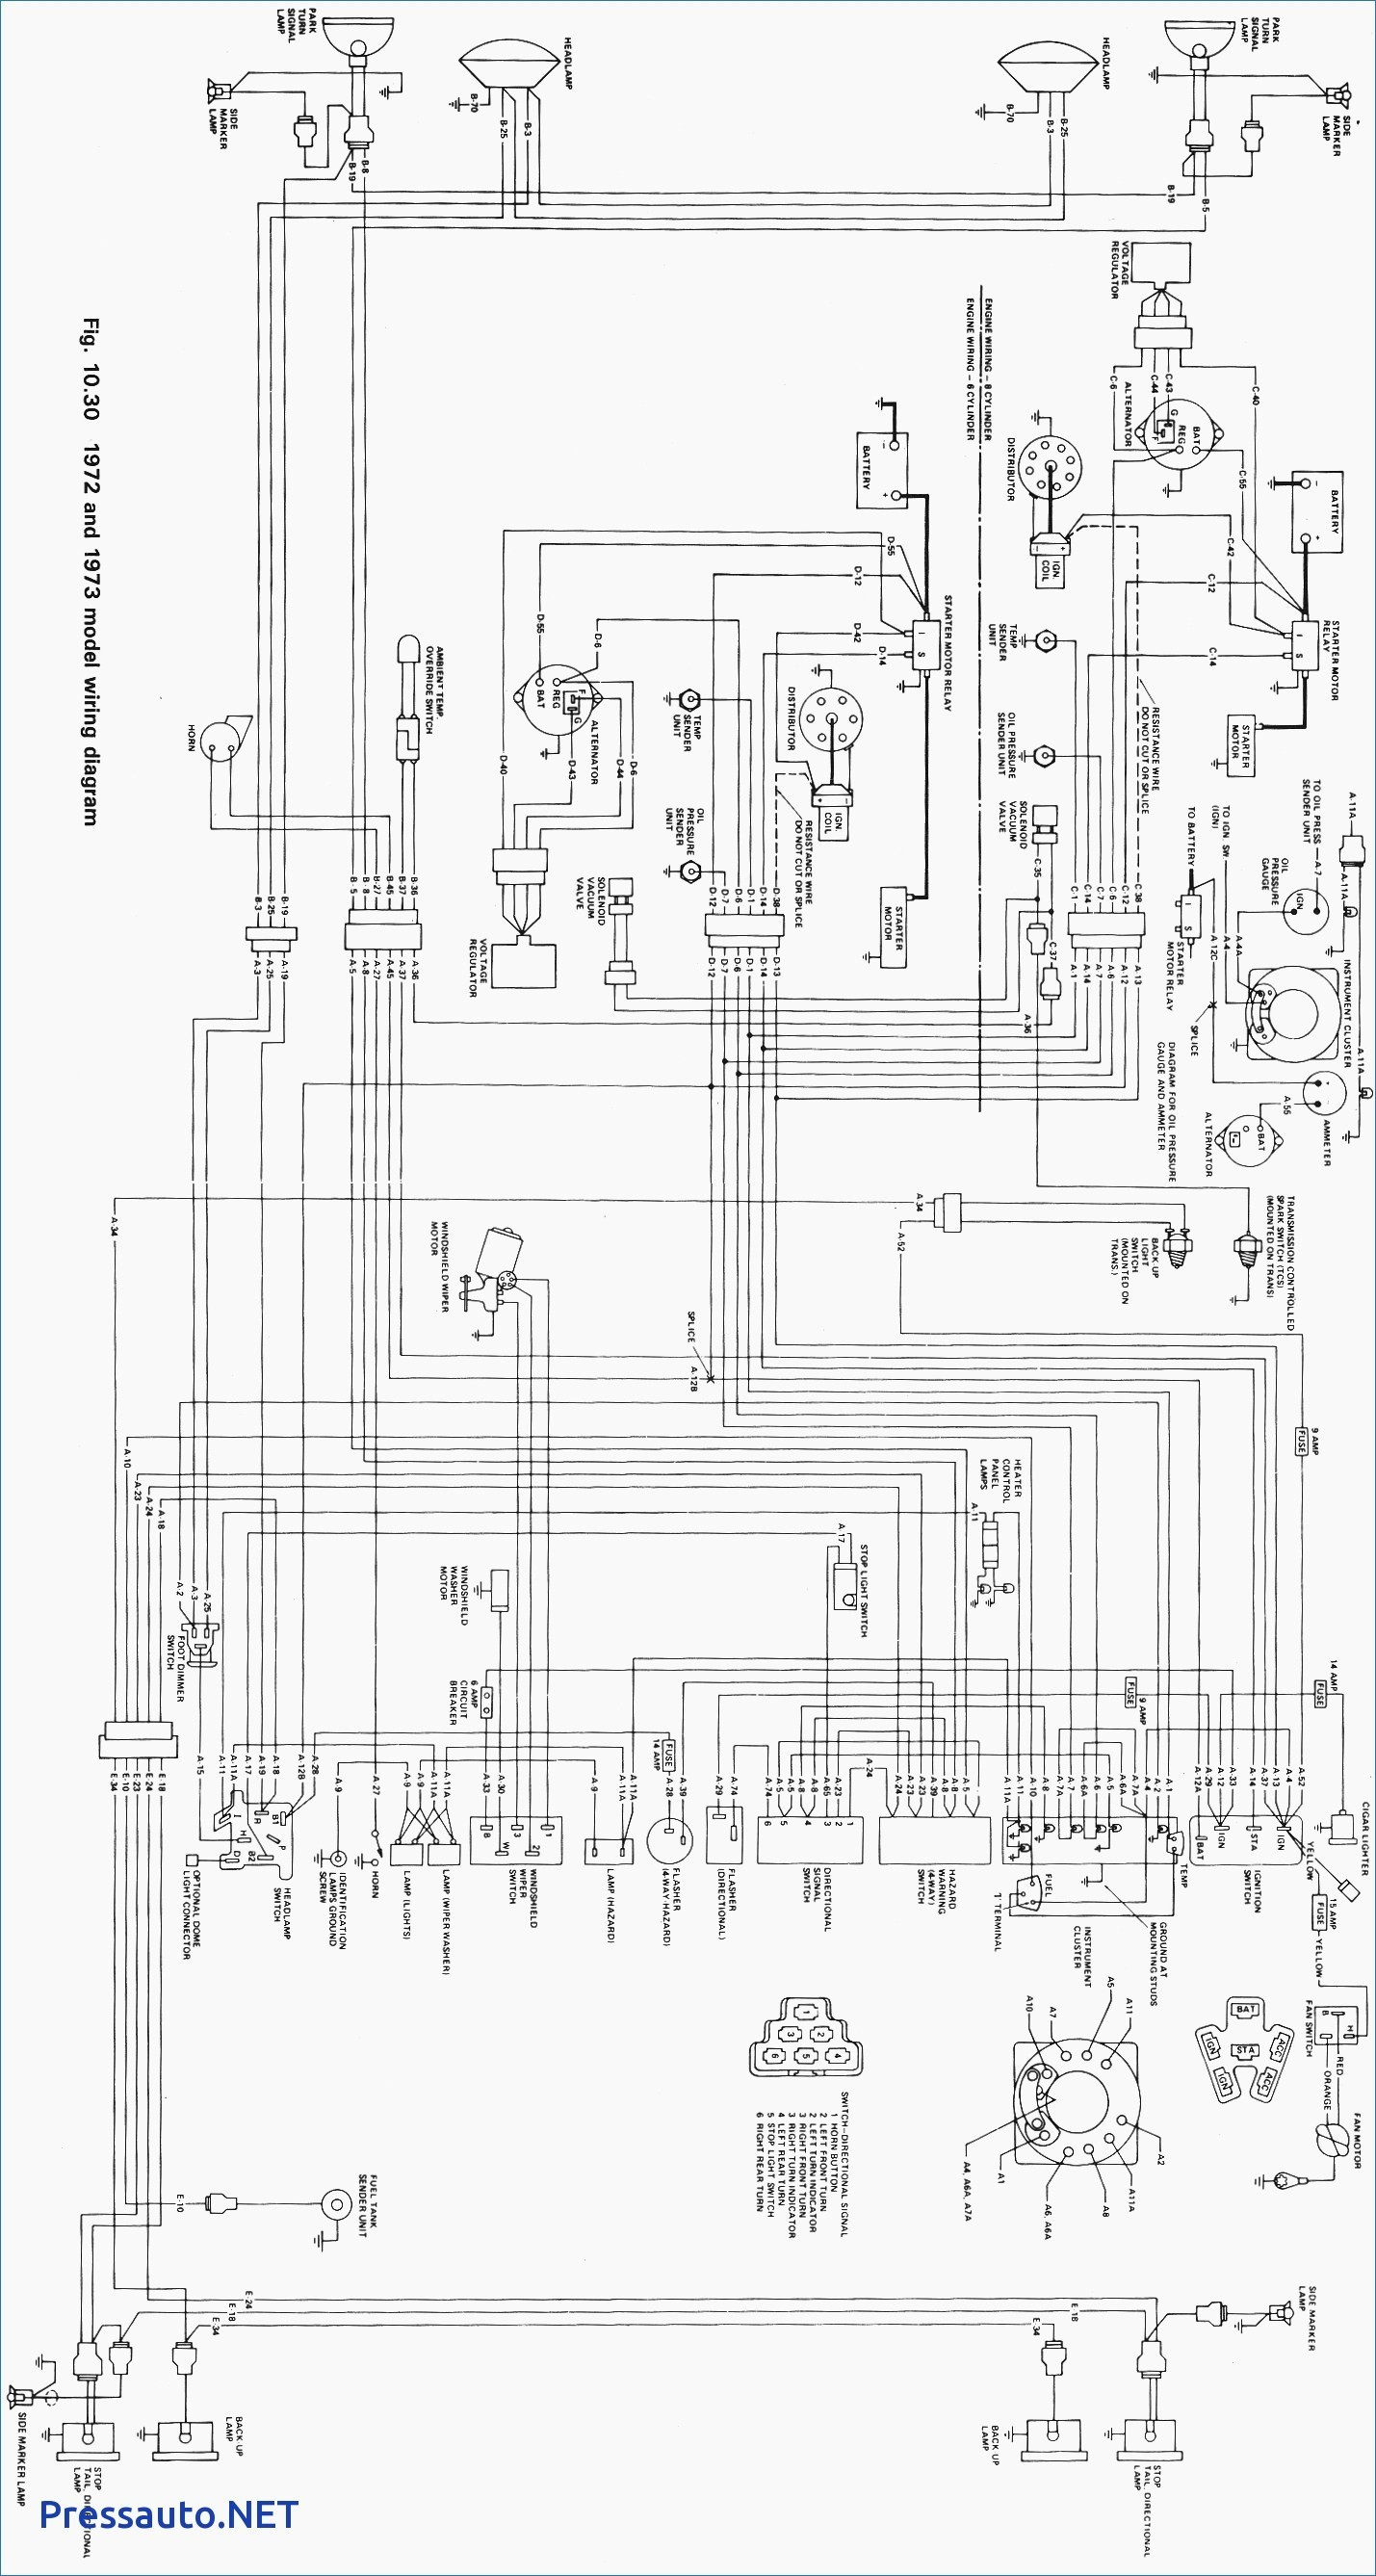 Willys Jeep Wiring Diagram M38 Jeep Wiring Diagram Another Blog About Wiring Diagram • Of Willys Jeep Wiring Diagram